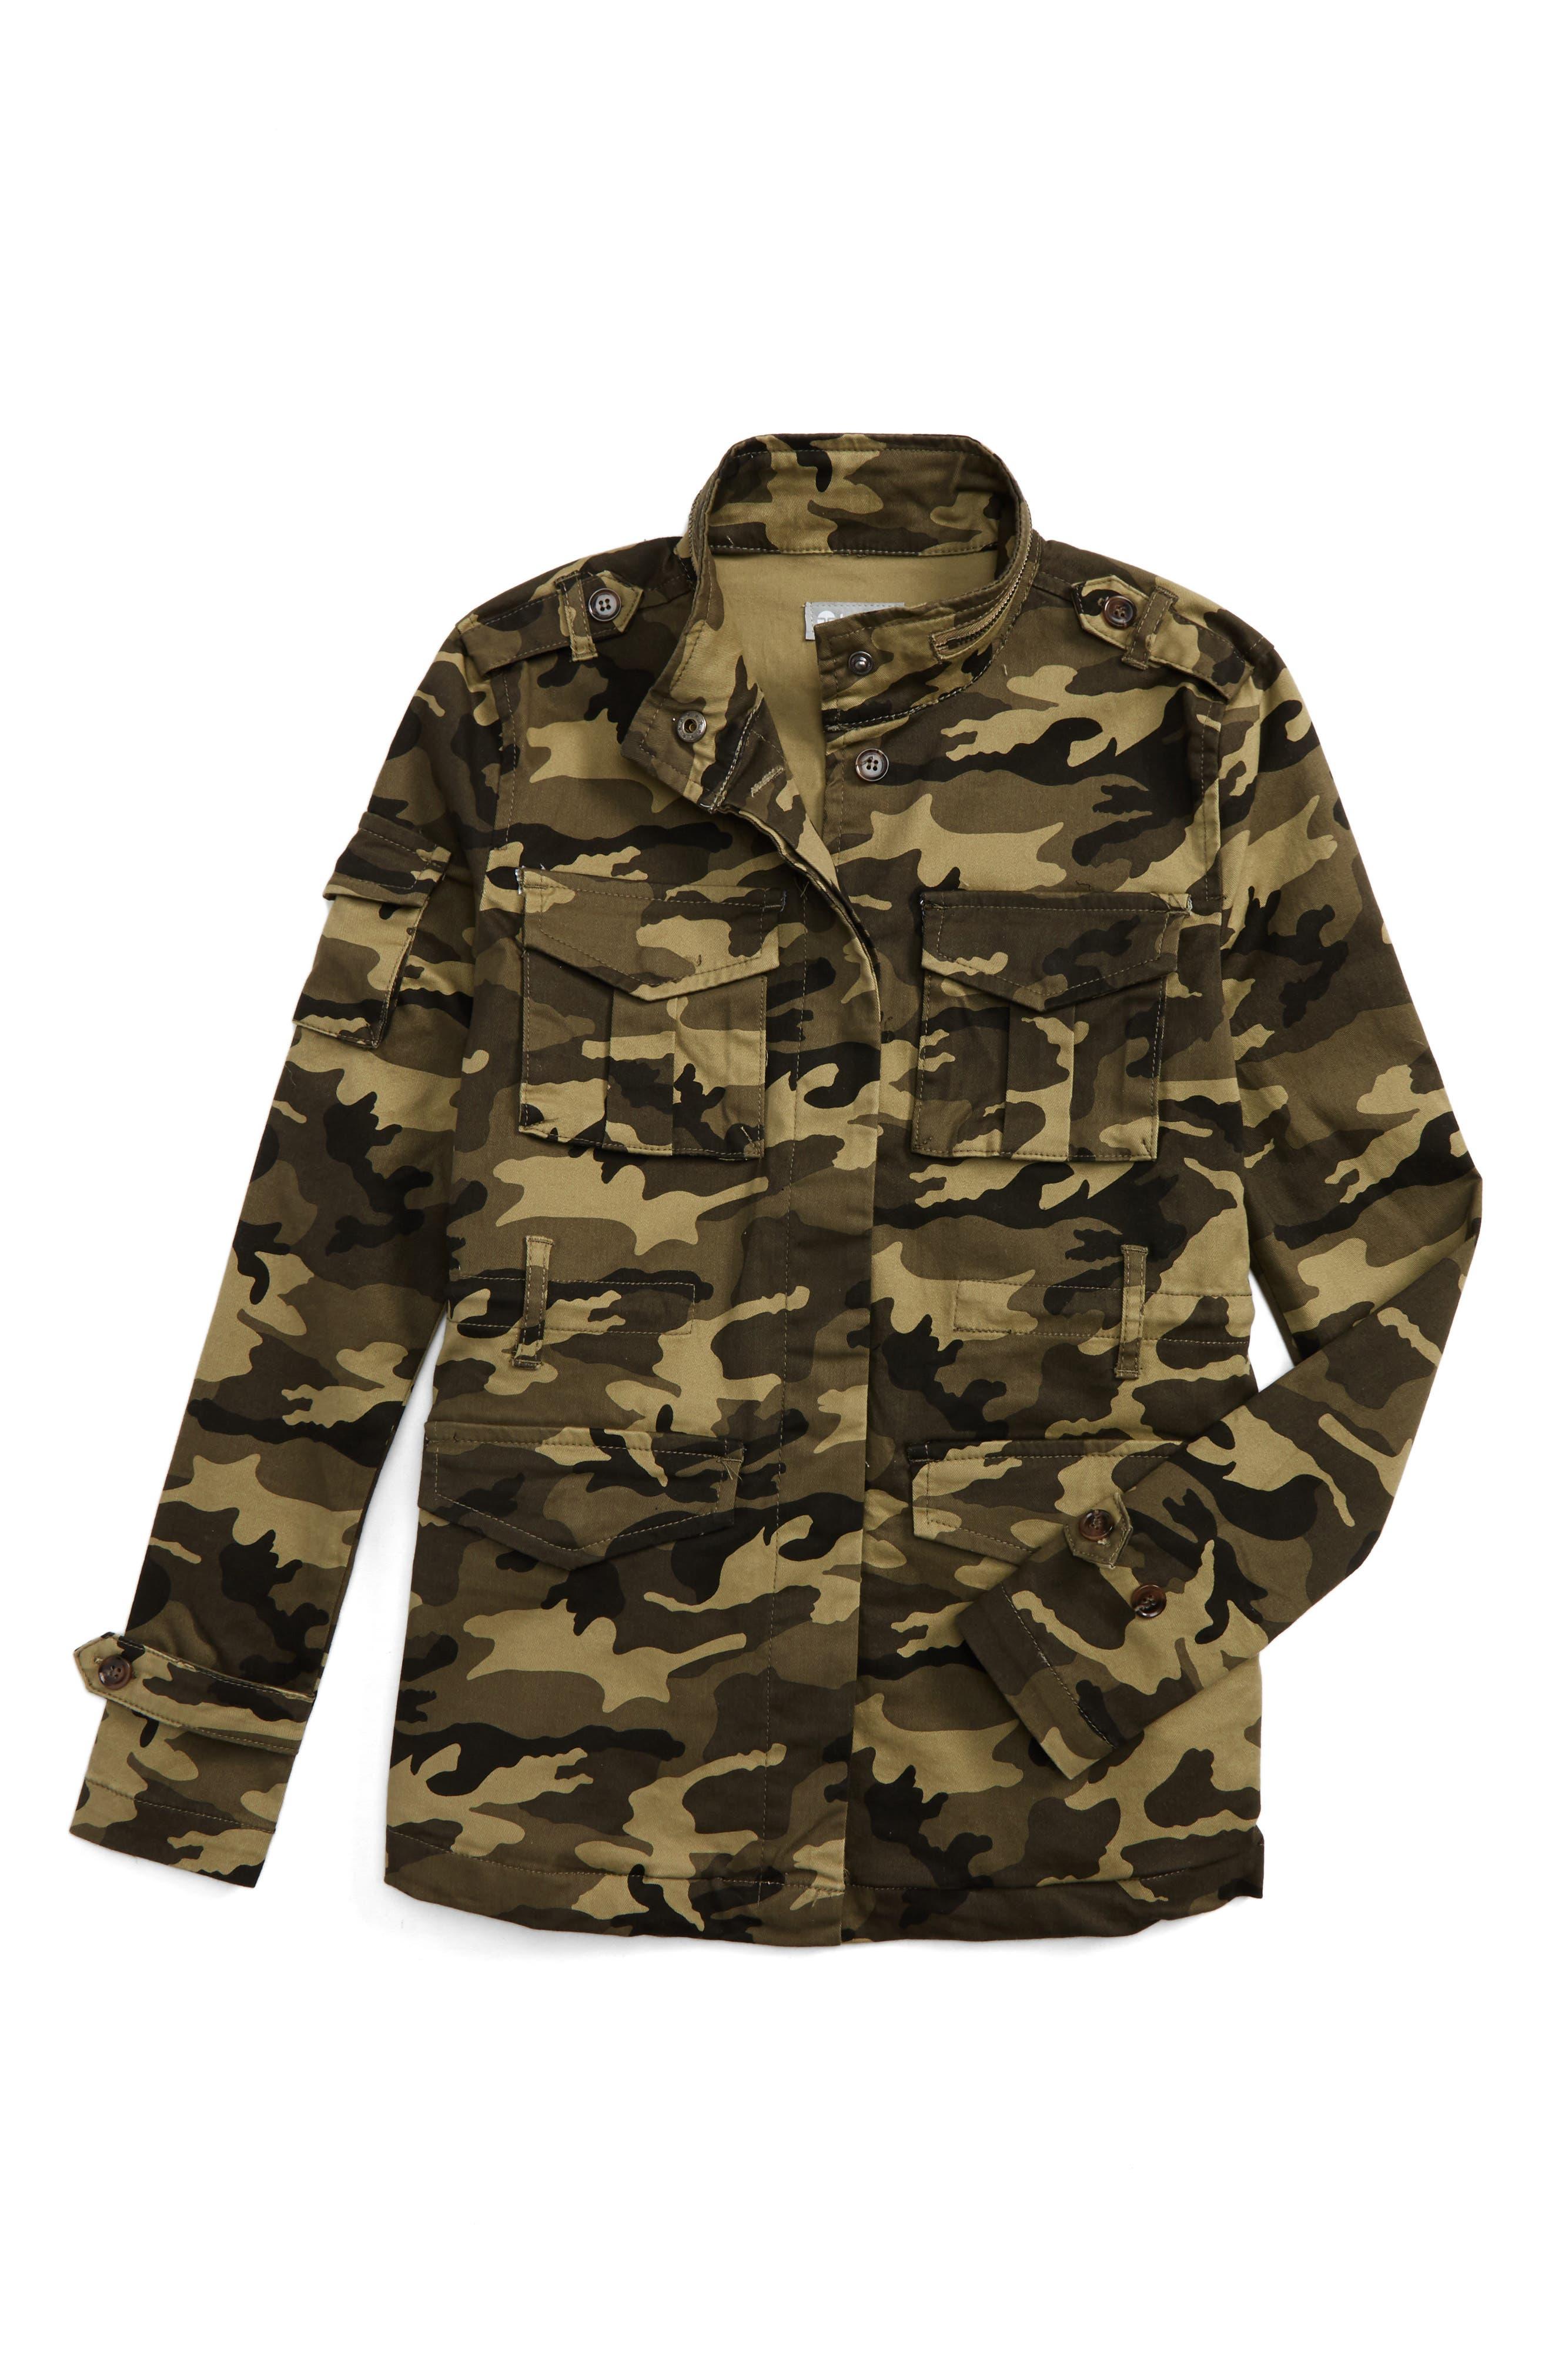 TRACTR Camo Anorak Jacket